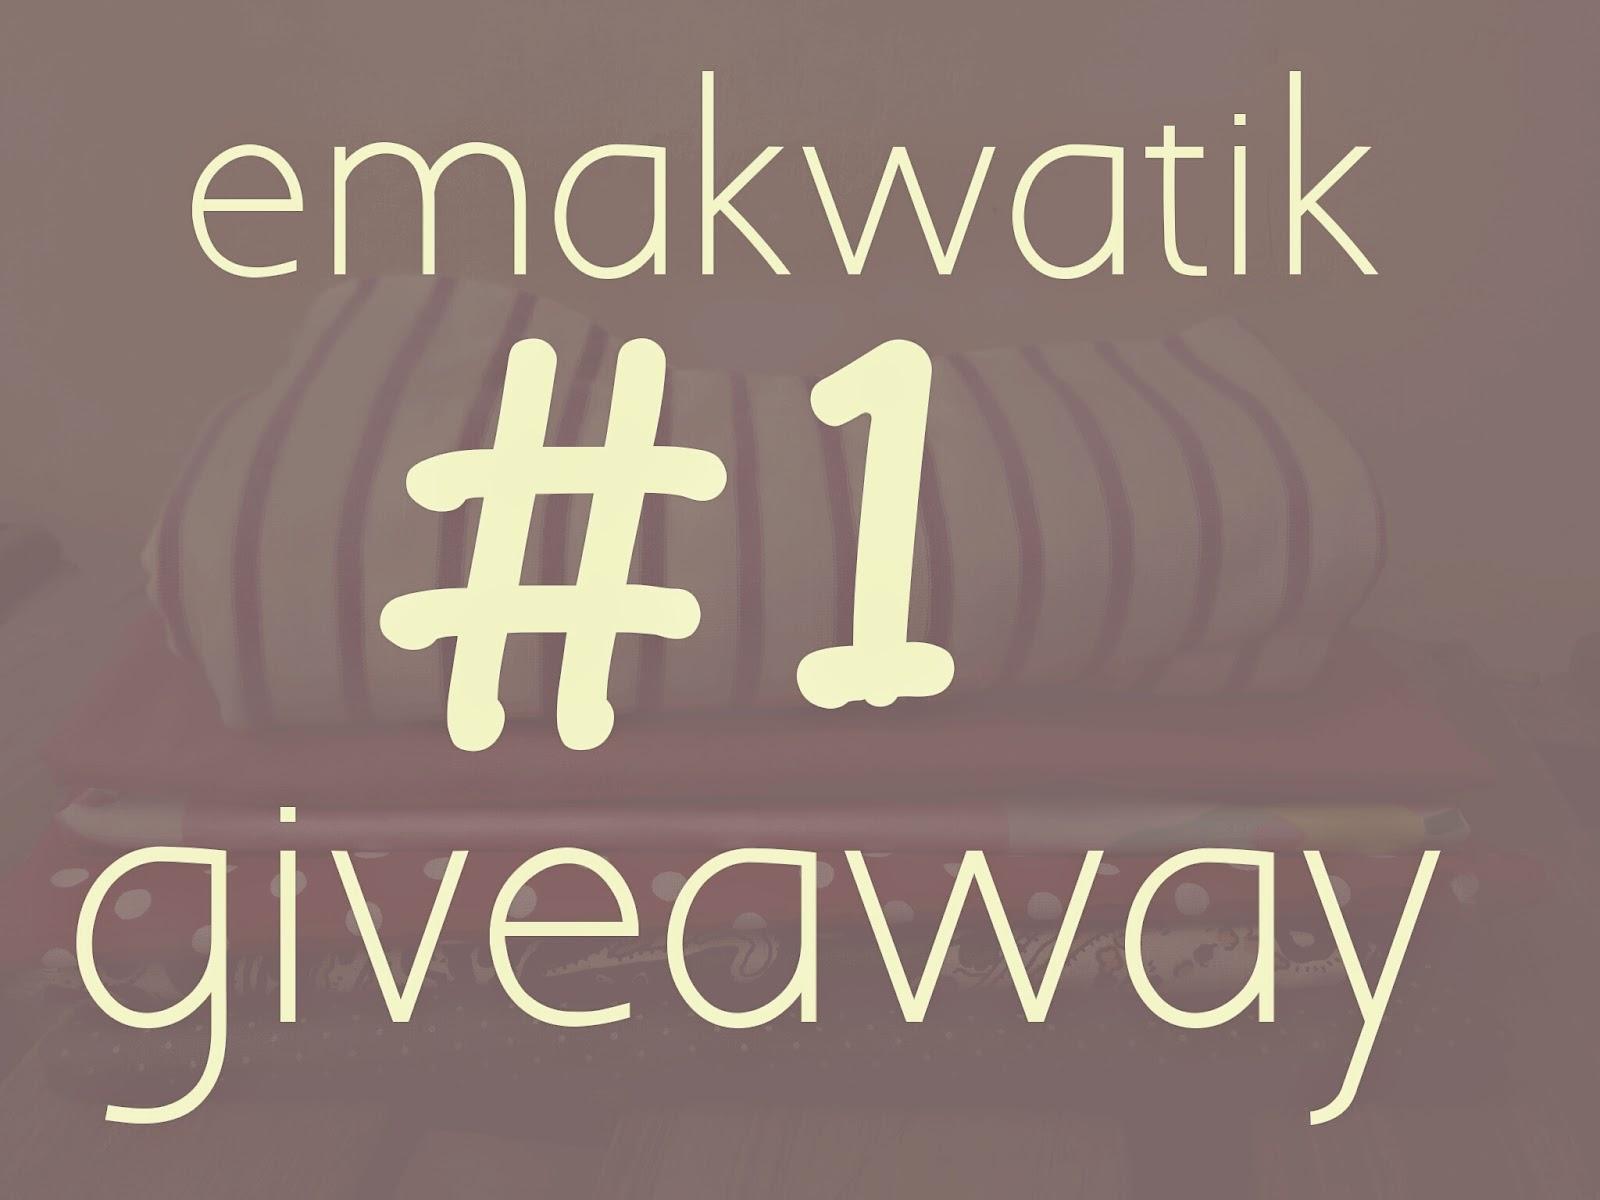 http://emakwatik.blogspot.com/2015/04/emakwatik-1-giveaway.html